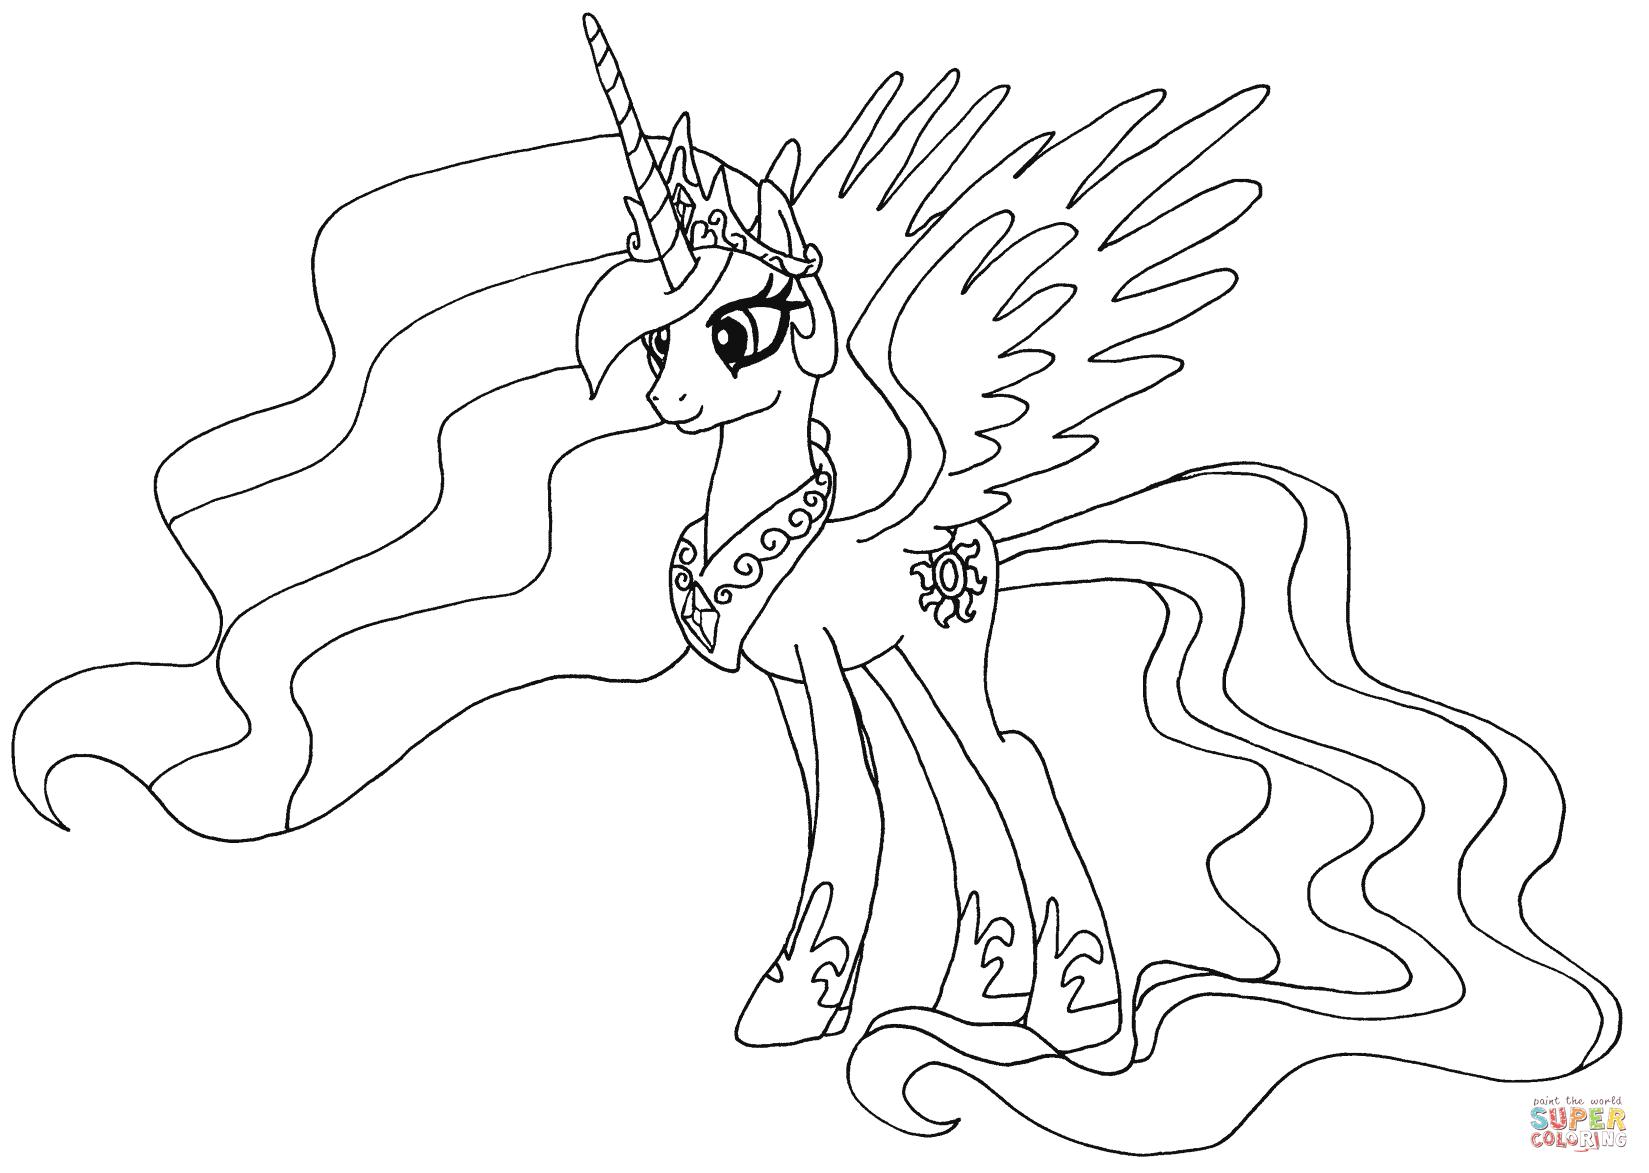 Princess Celestia from My Little Pony